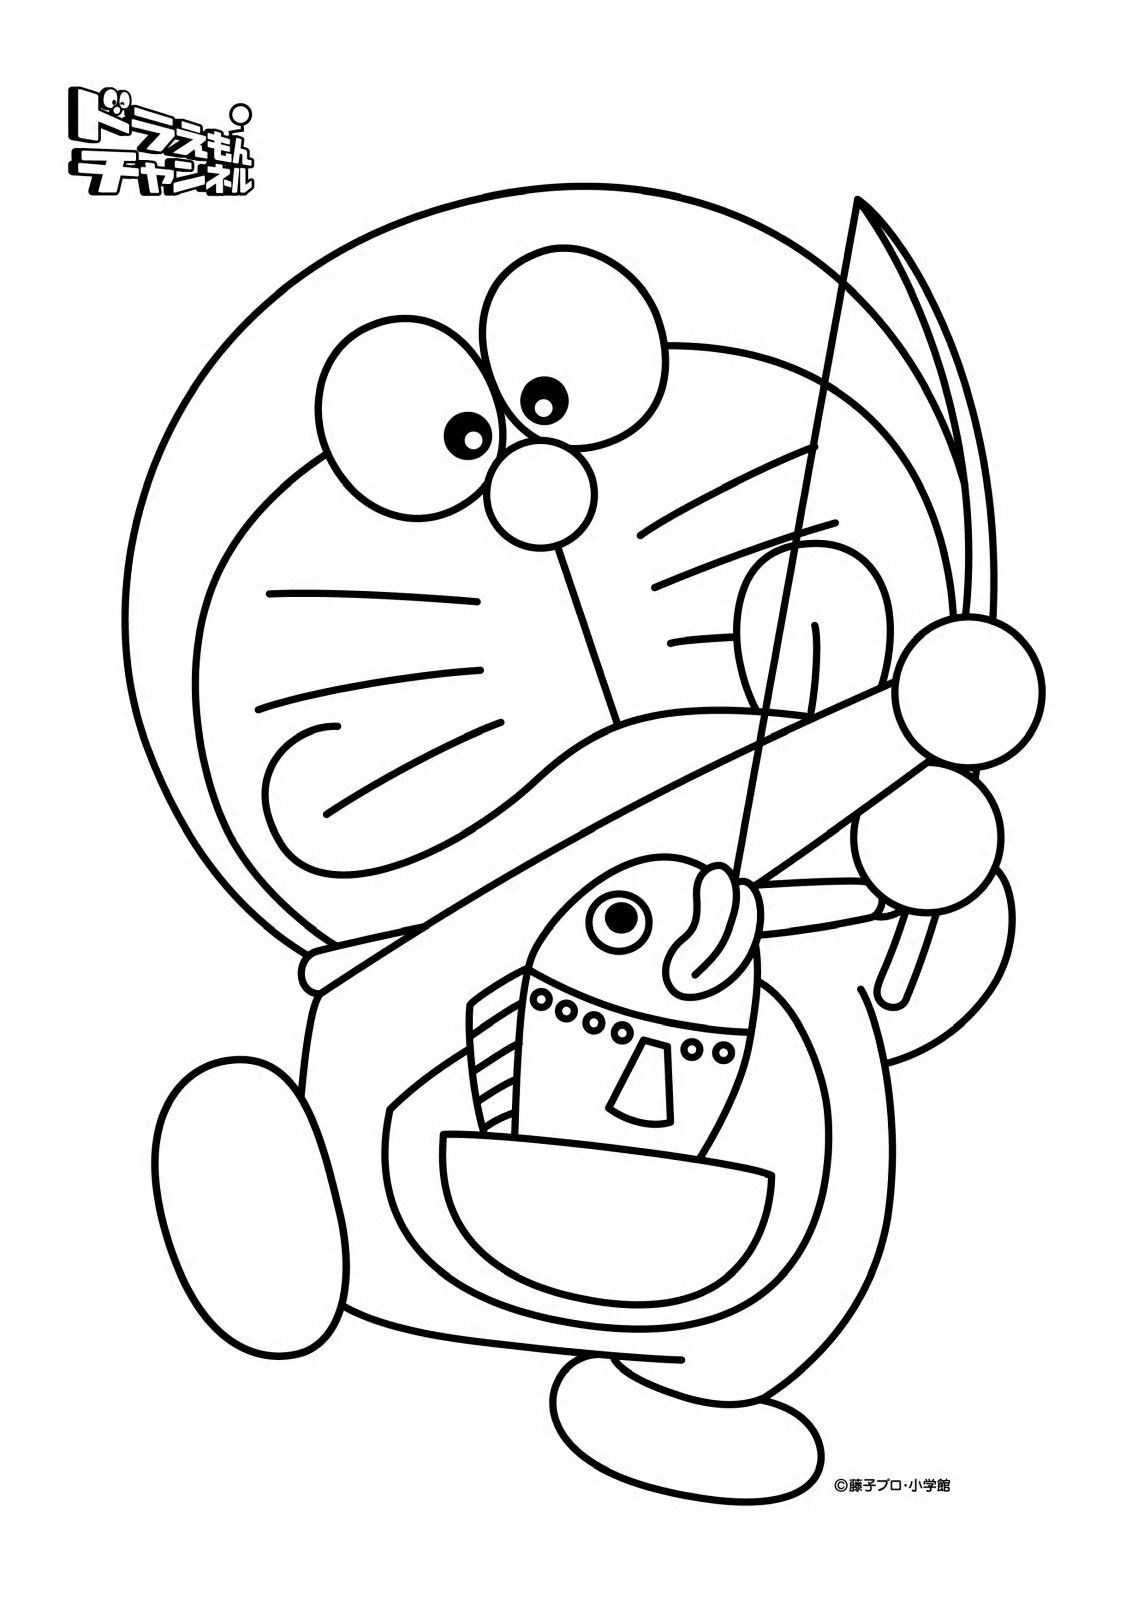 Doraemon Coloring Page | Sailor moon | Pinterest | Arya